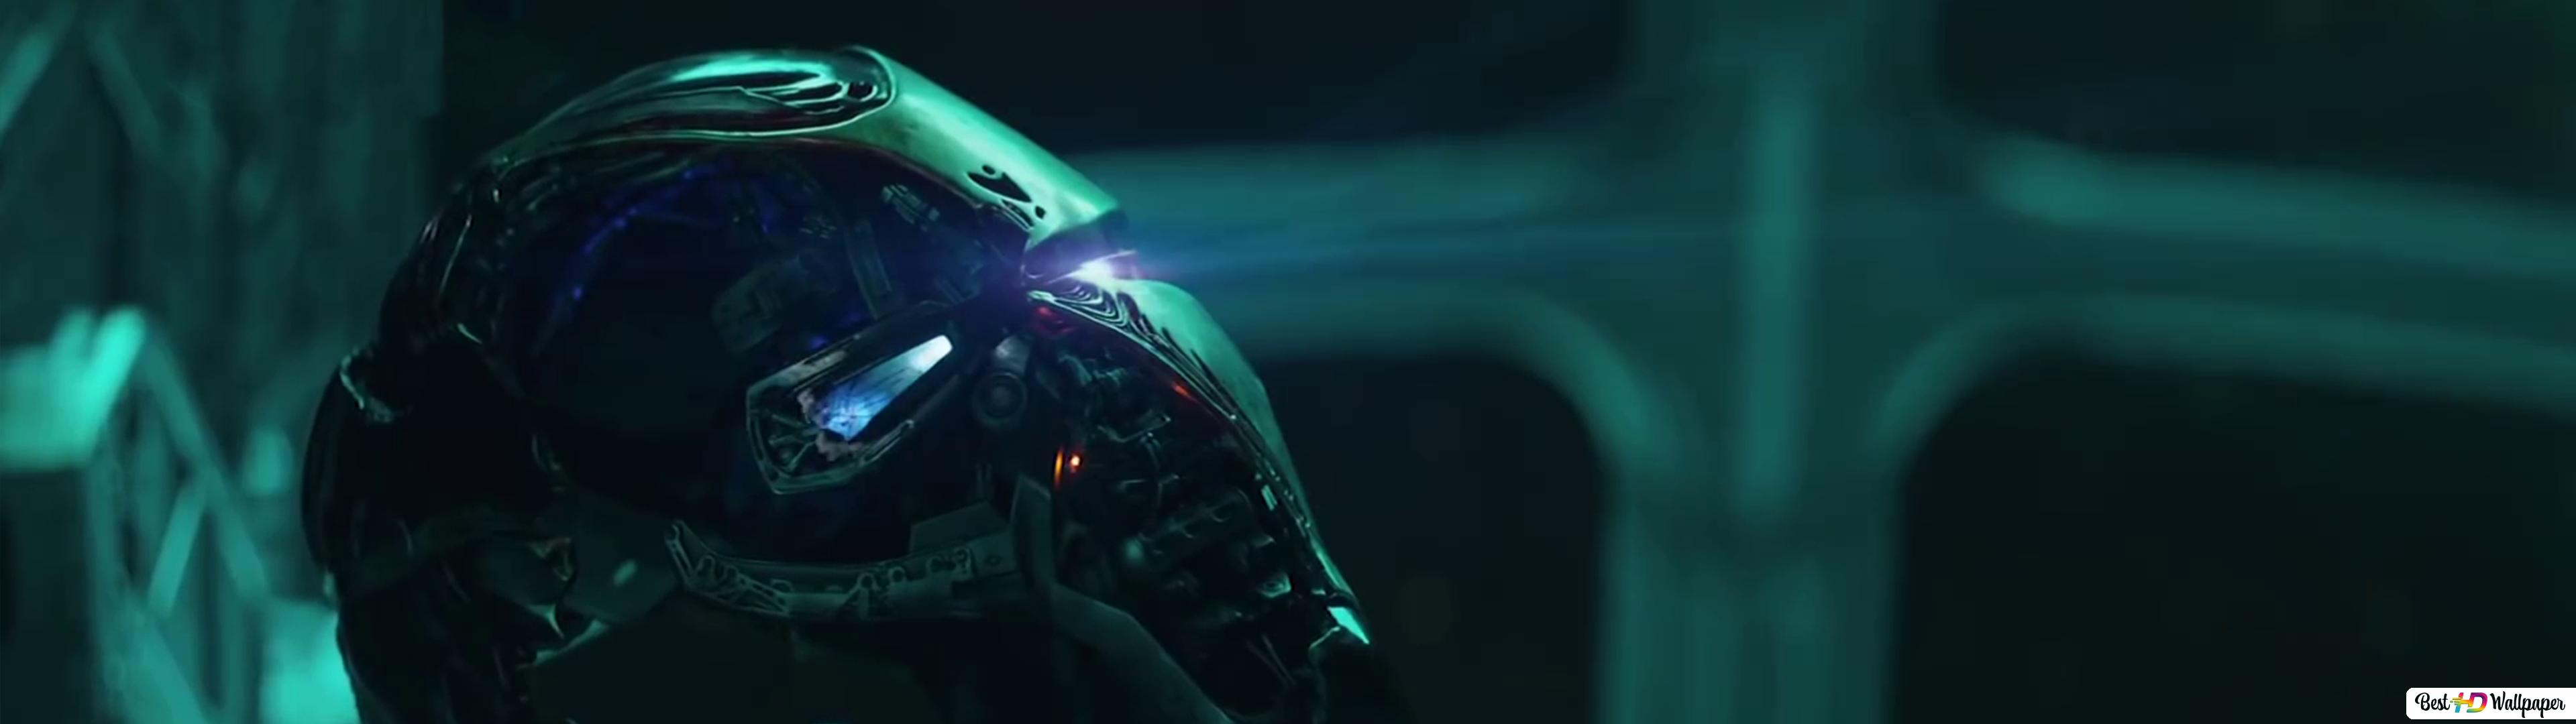 Avengers Endgame Iron Man Broken Helmet Hd Wallpaper Download